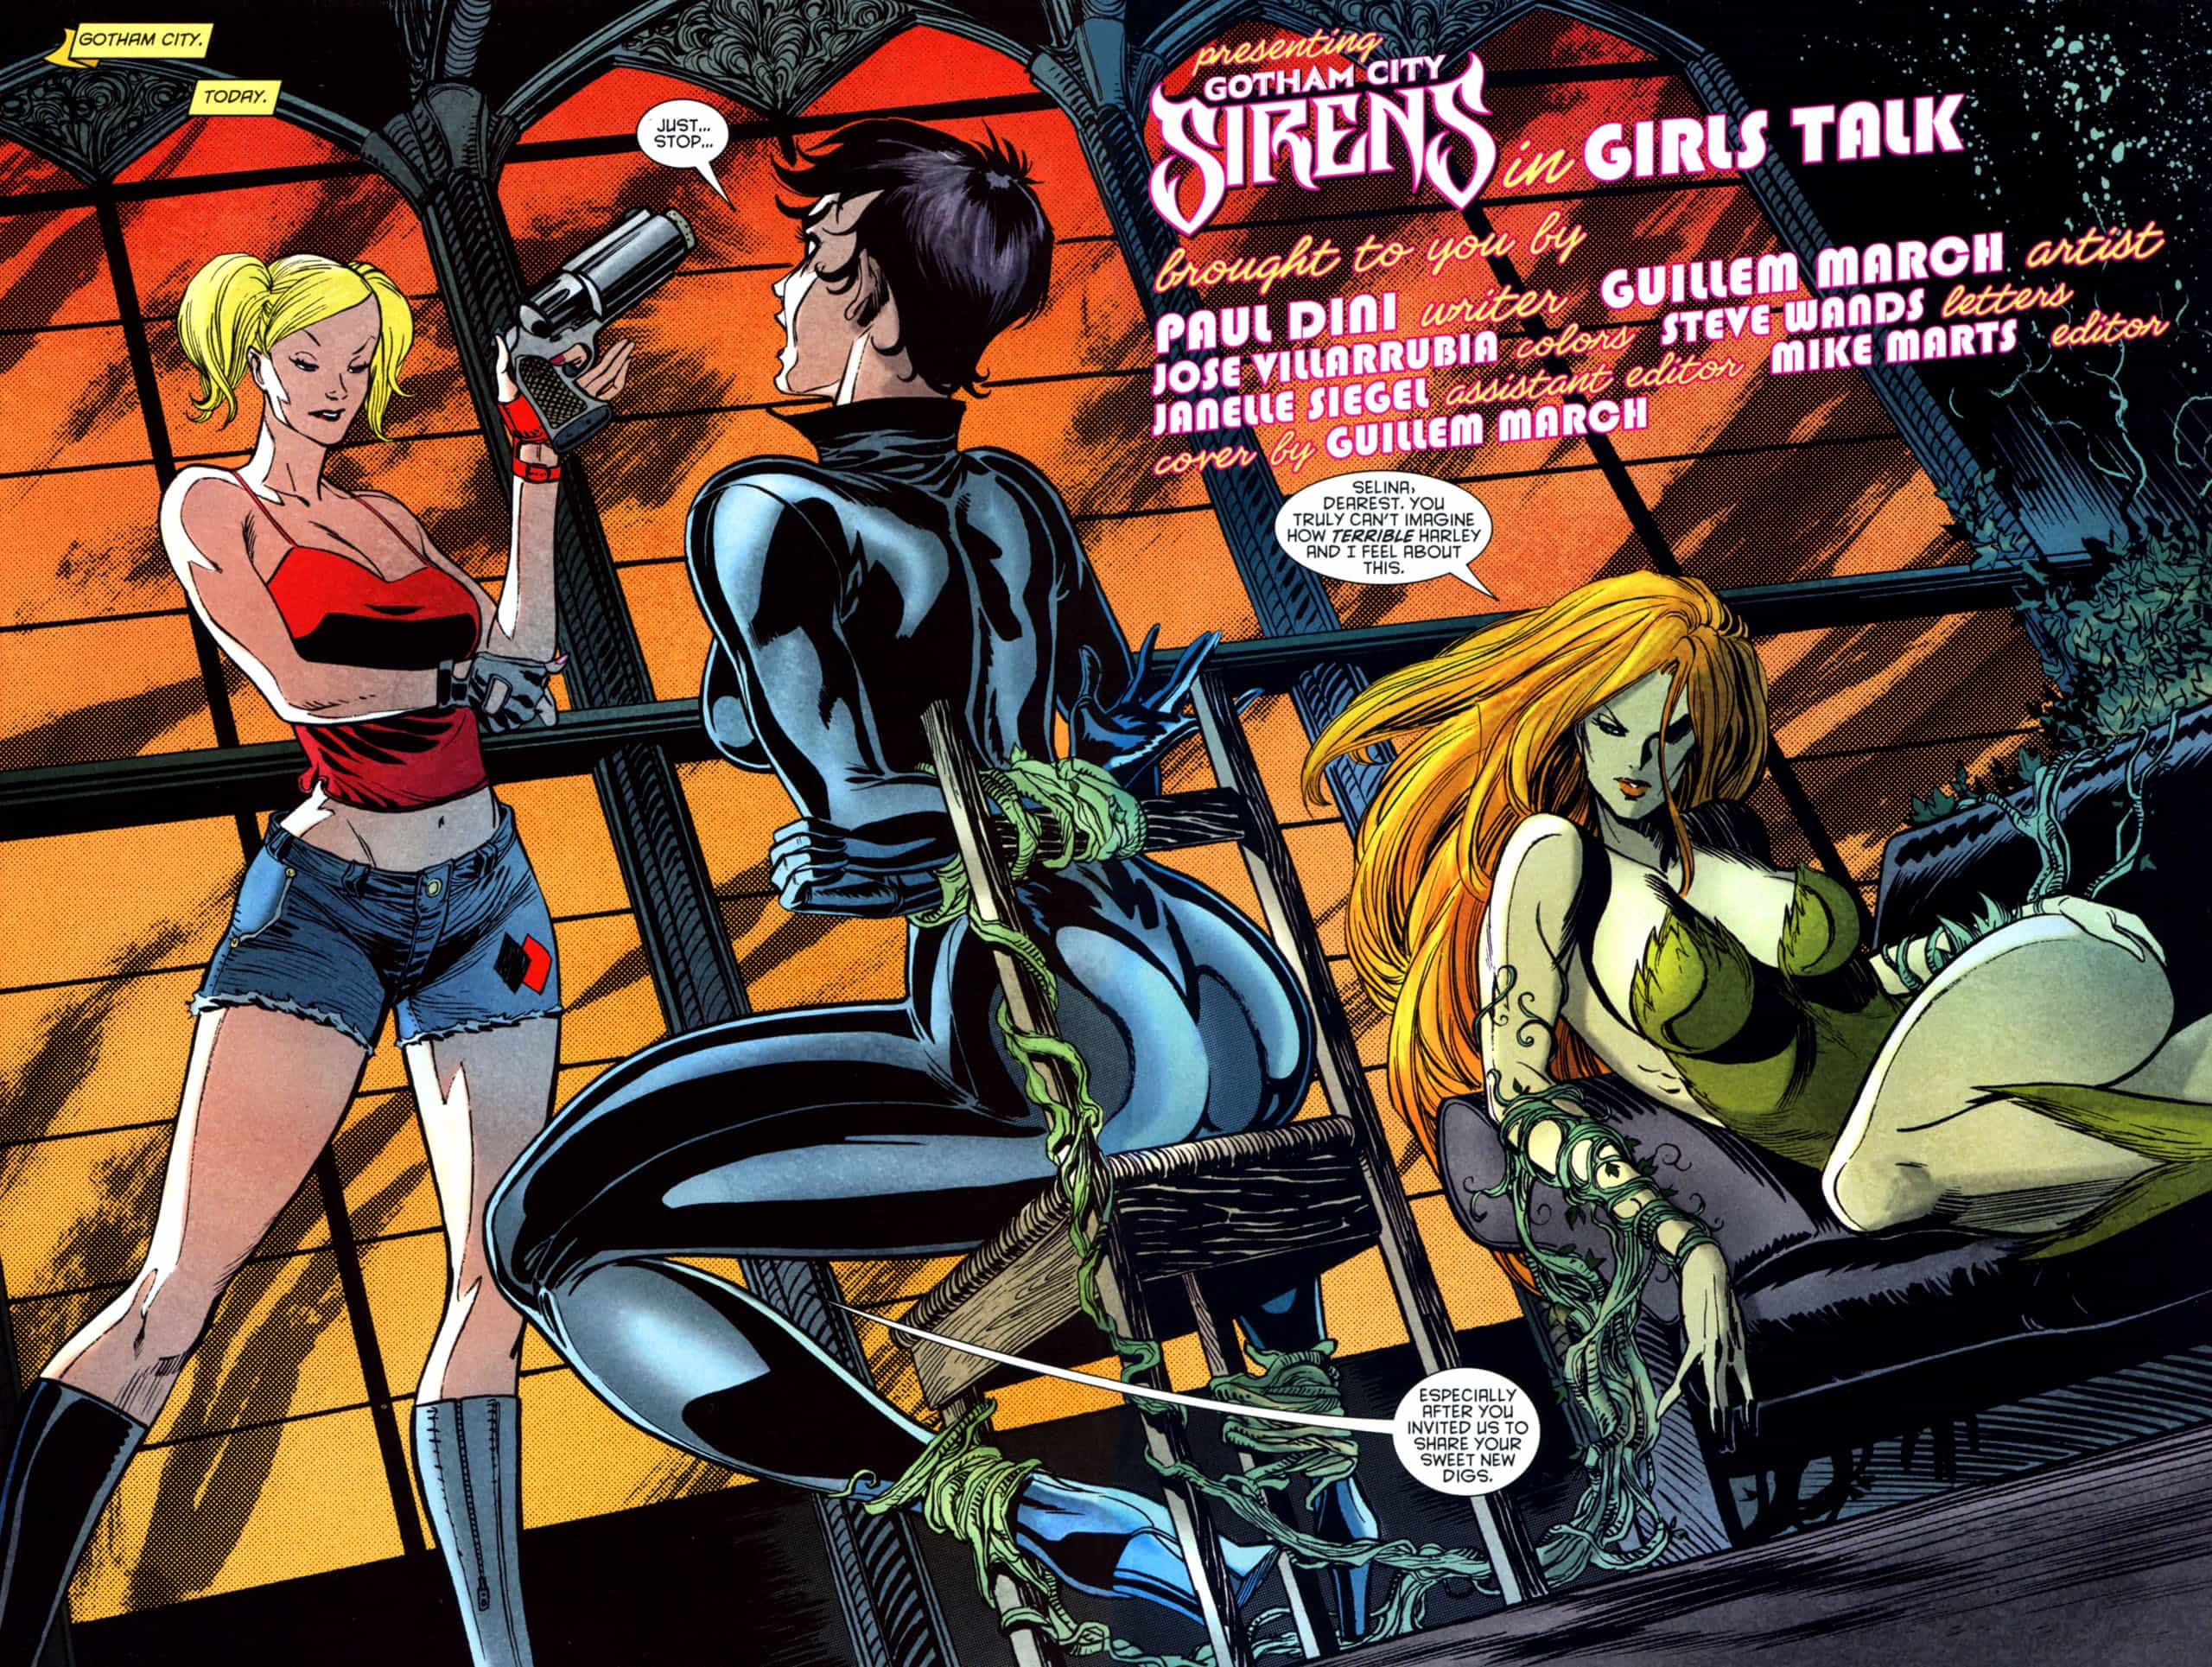 961891 Gotham City Sirens  2 005 06, Hay una lesbiana en mi sopa